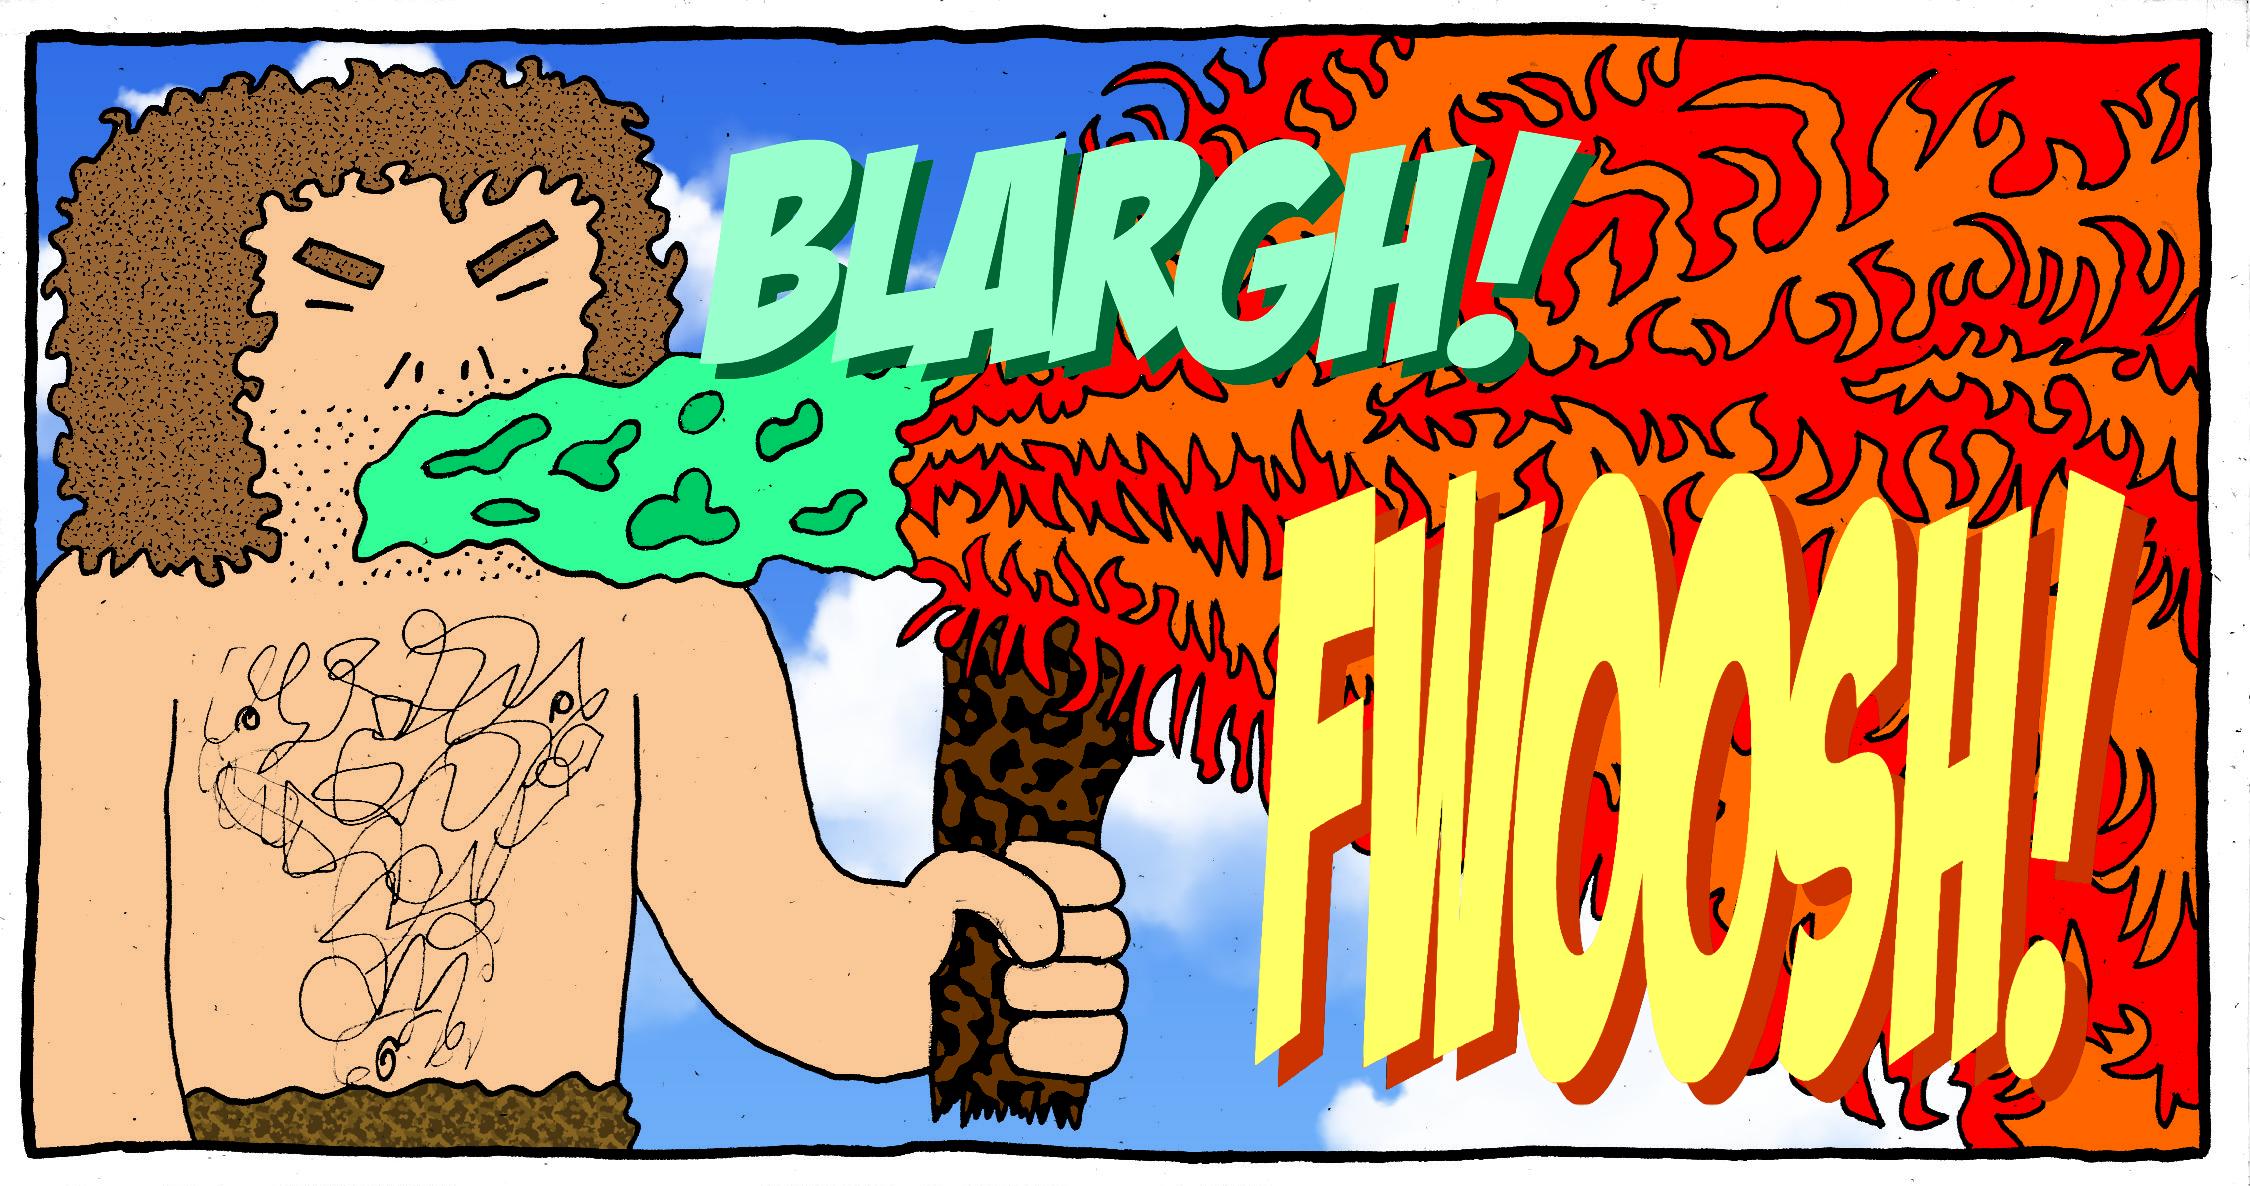 BLARGH